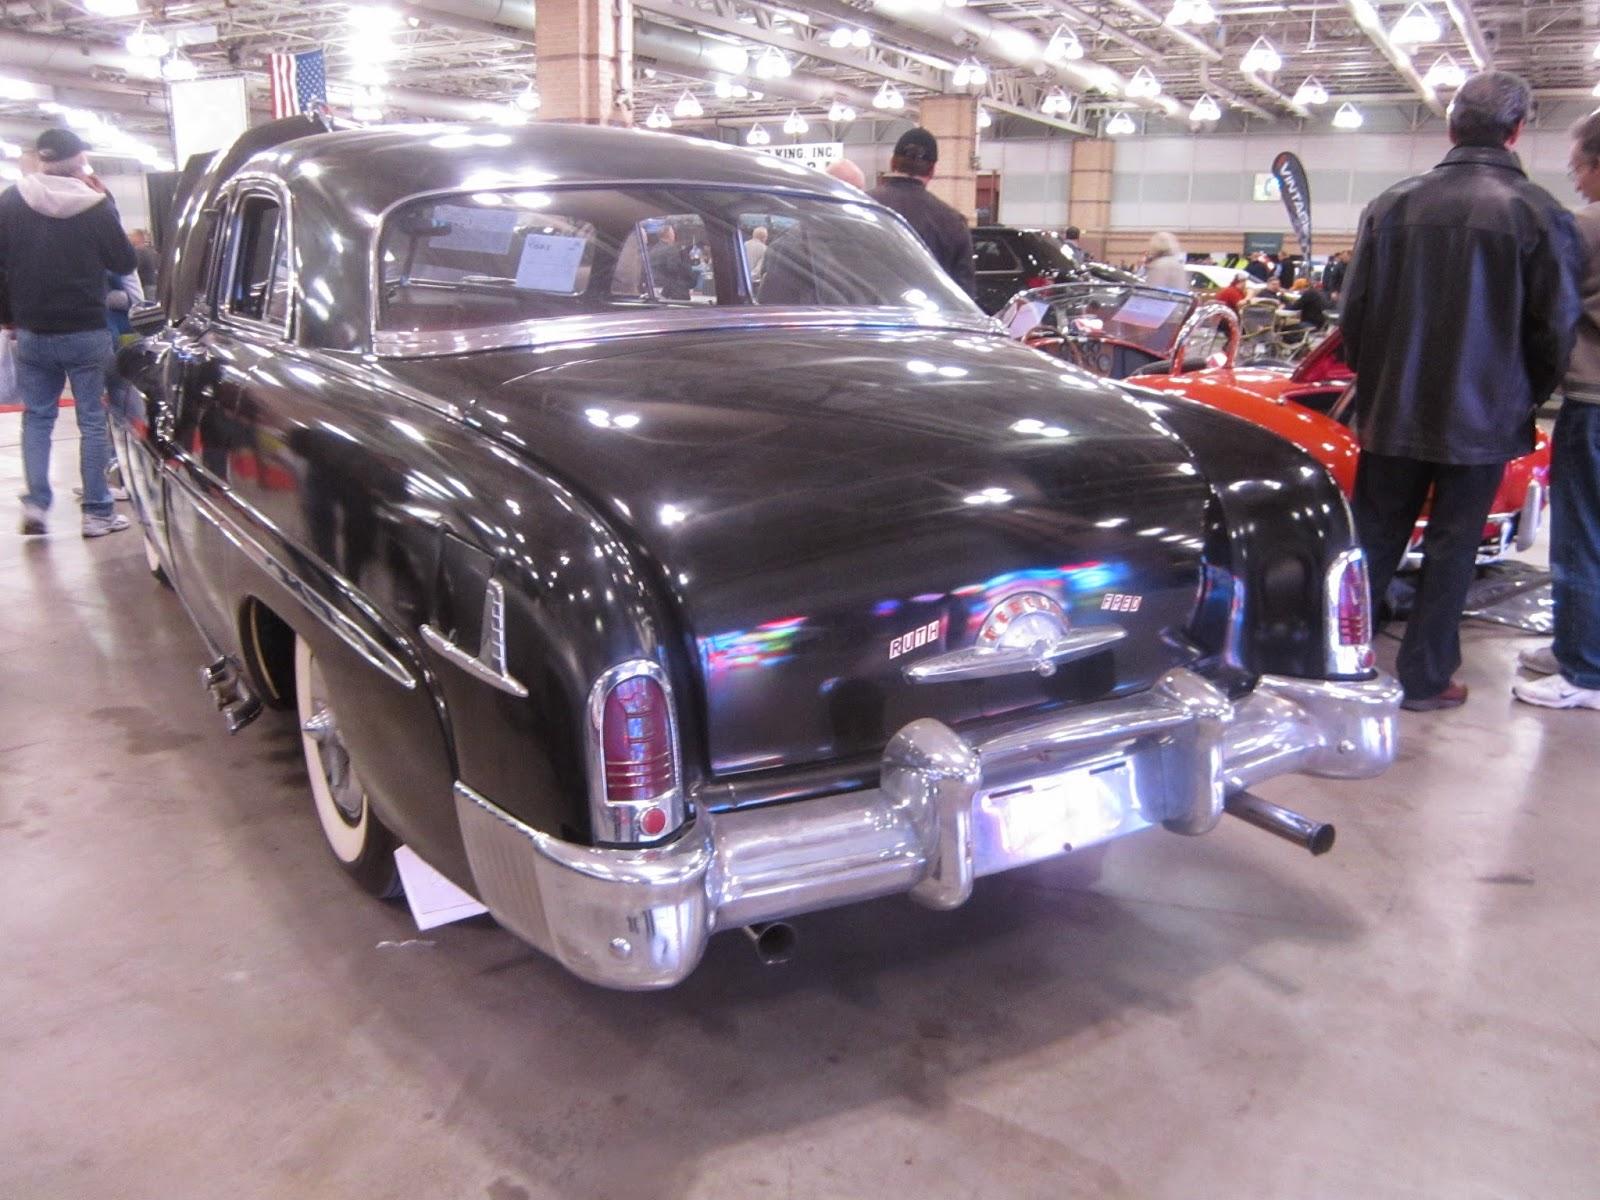 A conservative blog for peace: 2015 Atlantic City Classic Car Show